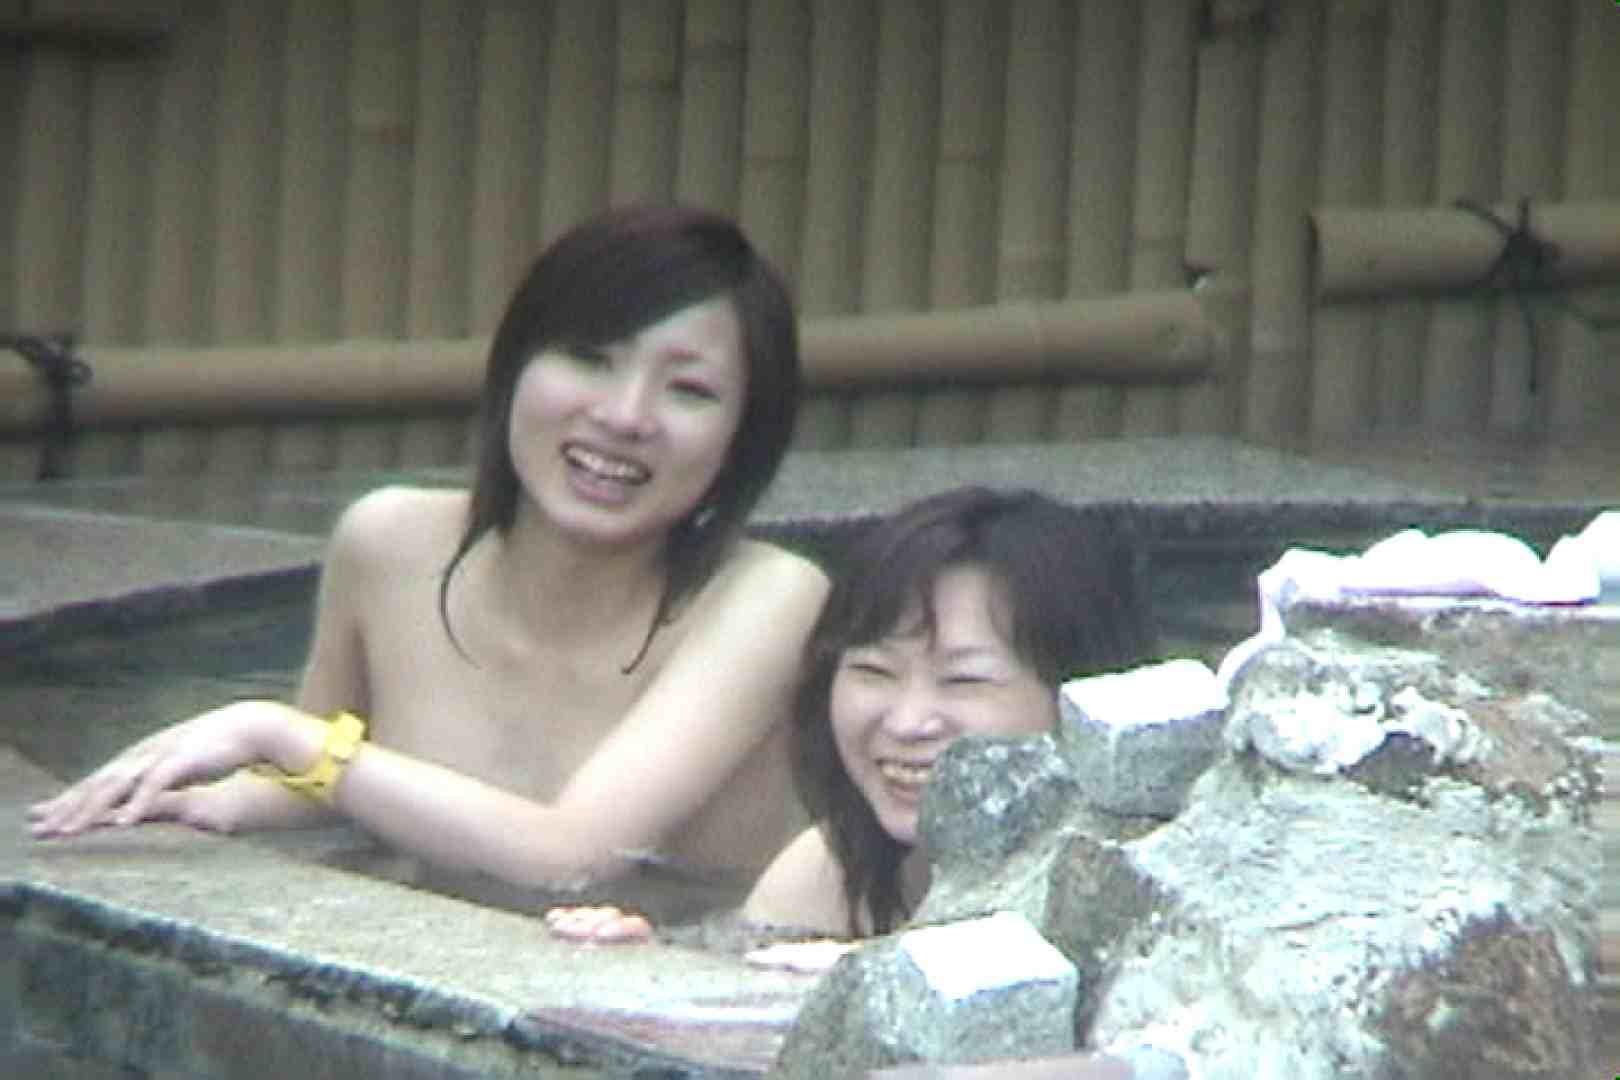 Aquaな露天風呂Vol.58【VIP限定】 露天風呂突入 盗撮動画紹介 97pic 44